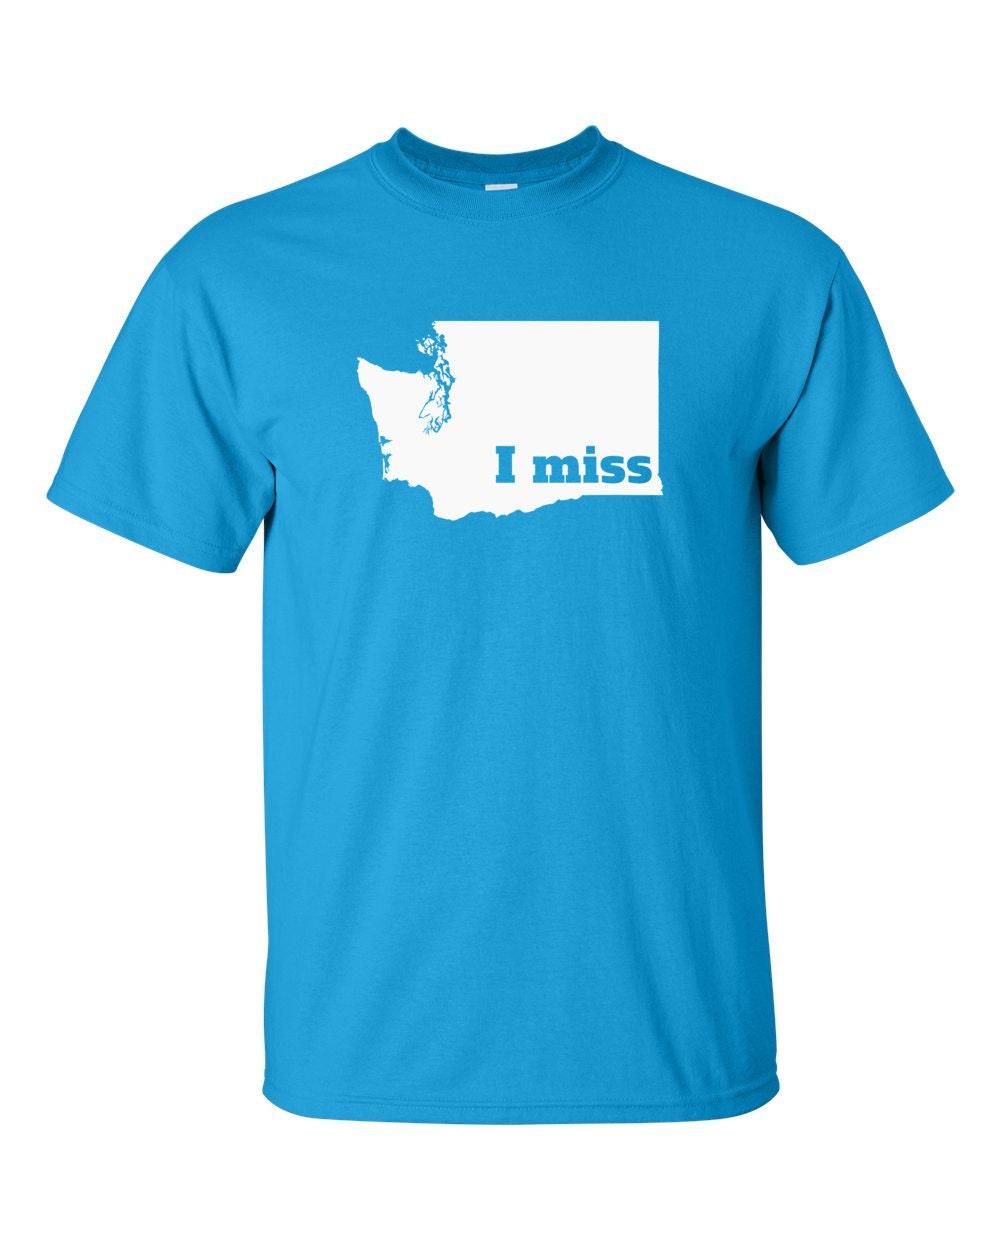 Washington T-shirt - I Miss Washington - My State Washington T-shirt